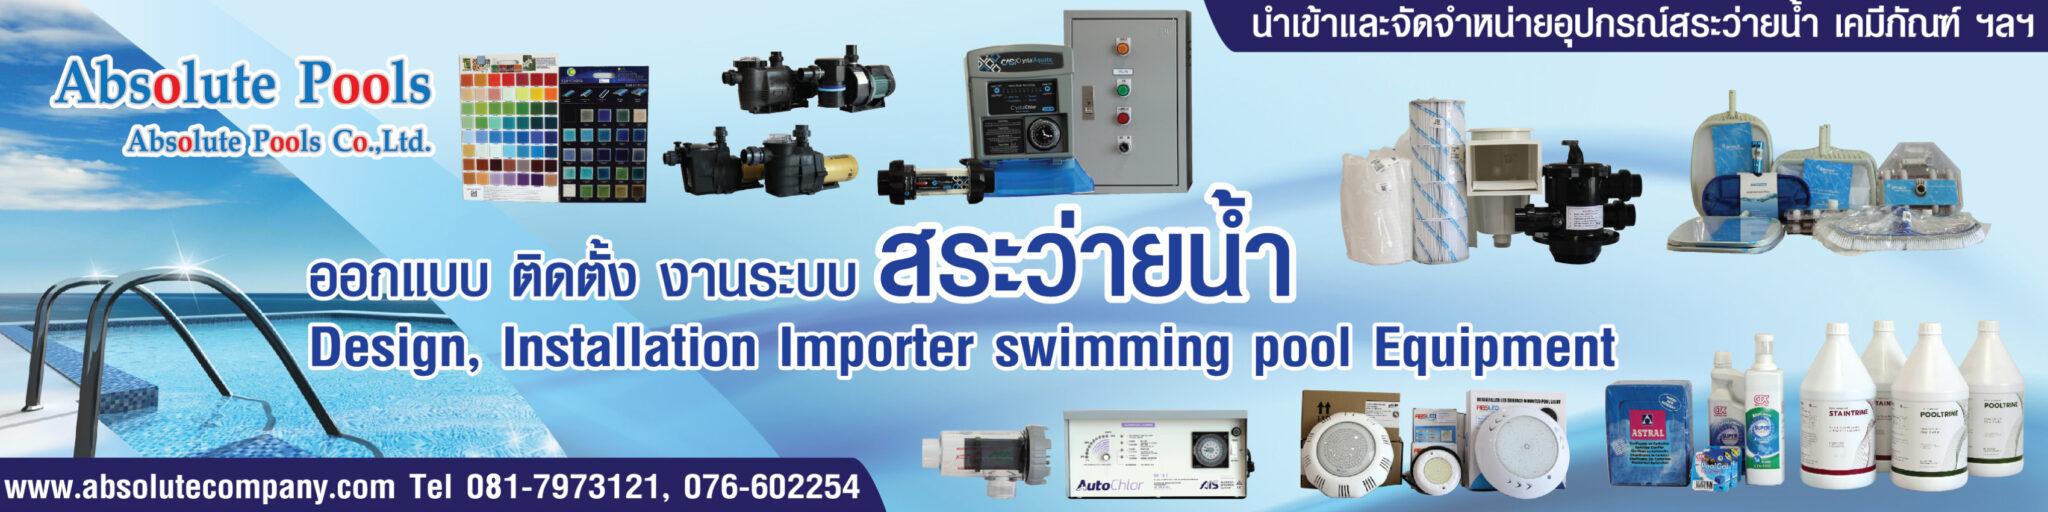 Abs ออกแบบ งานระบบ ซ่อม จำหน่ายอุปกรณ์ สระว่ายน้ำ